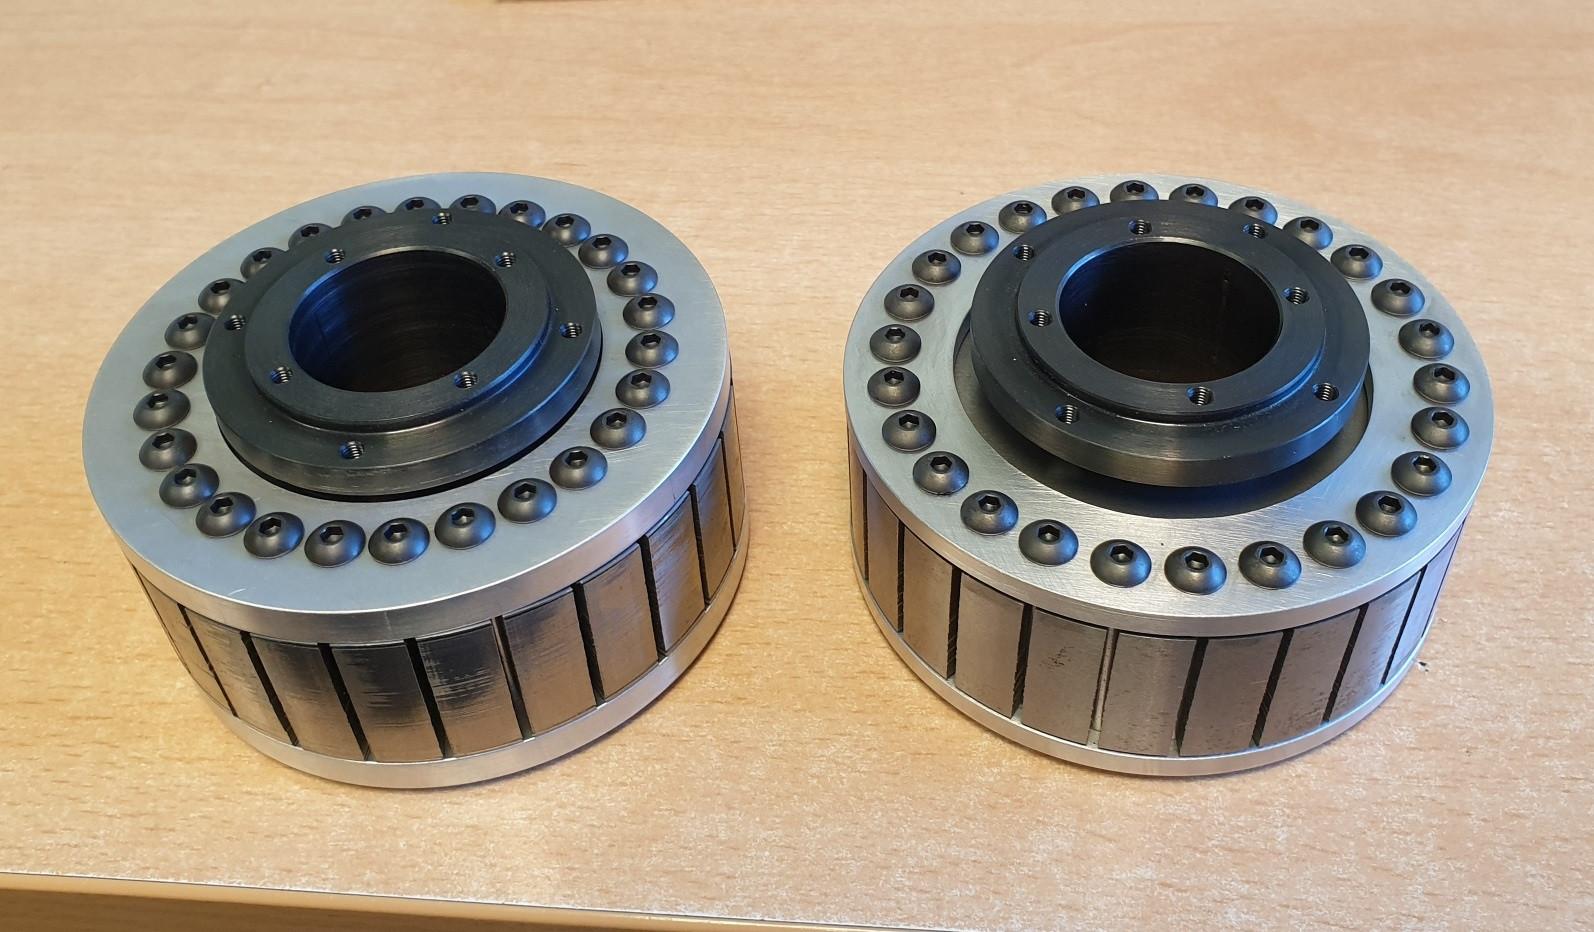 Electric motor rotor assemblies